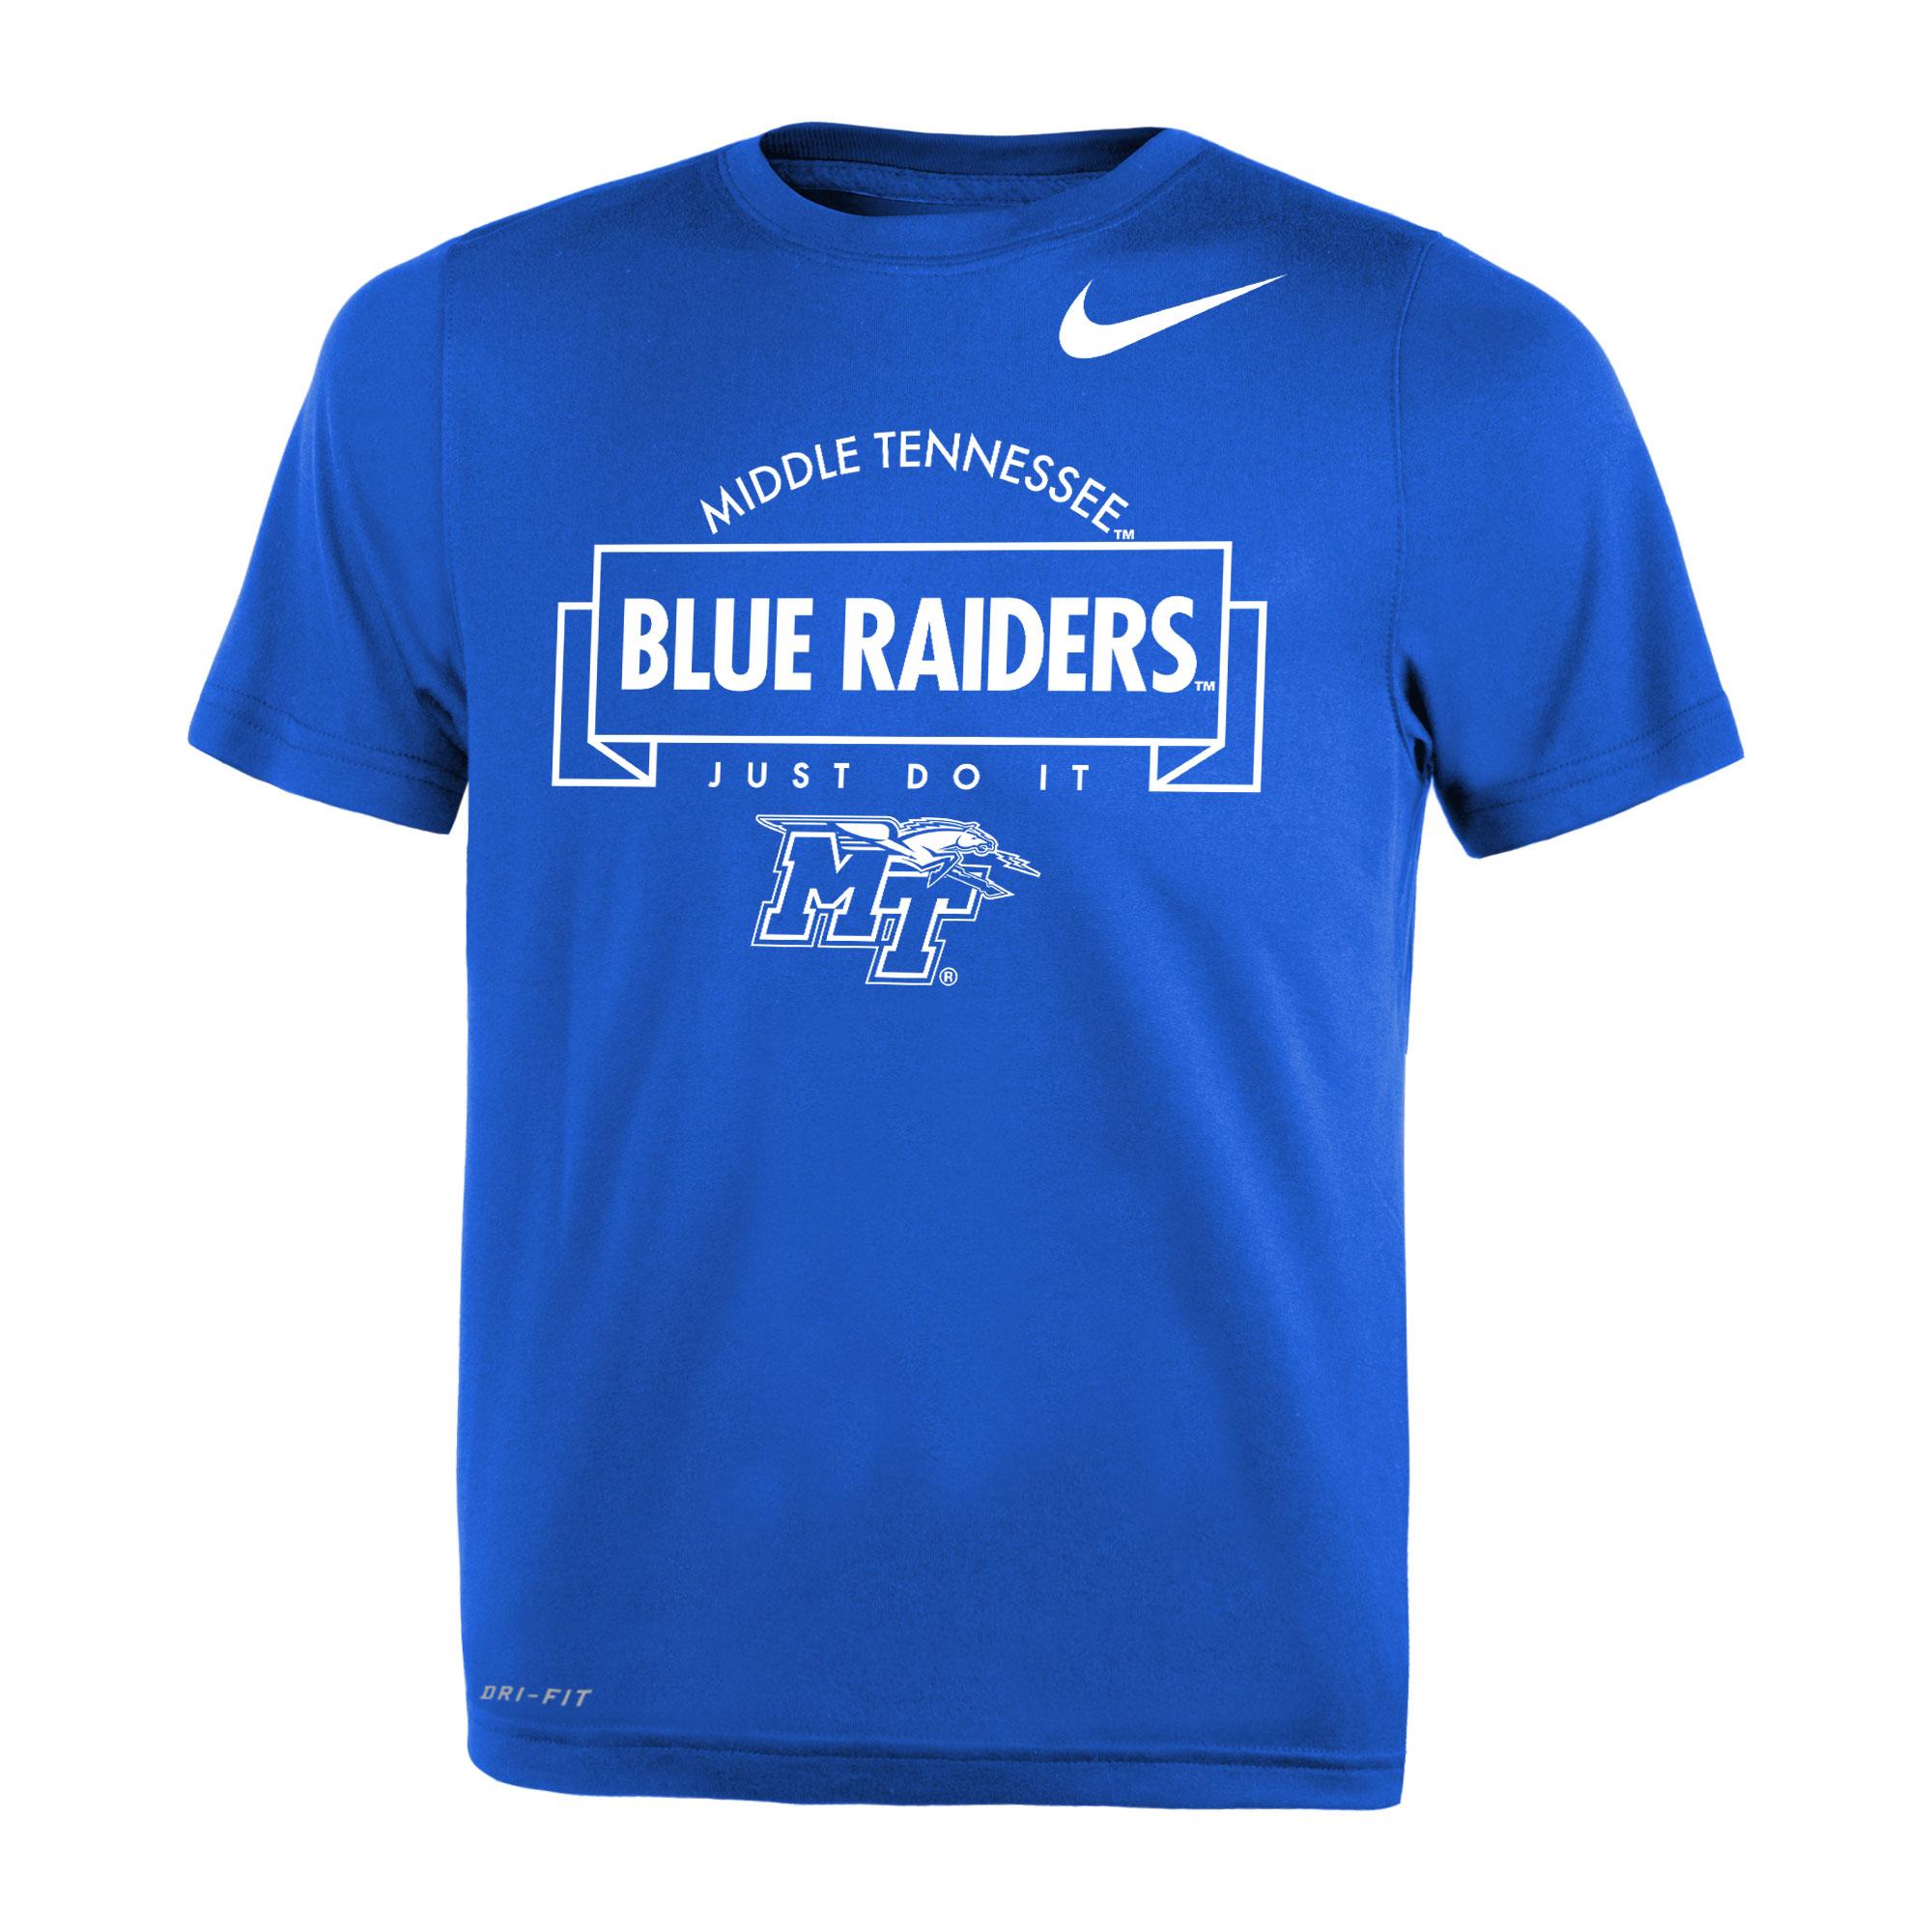 Middle Tennessee Blue Raiders Just Do It Nike® Preschool Legend Shirt